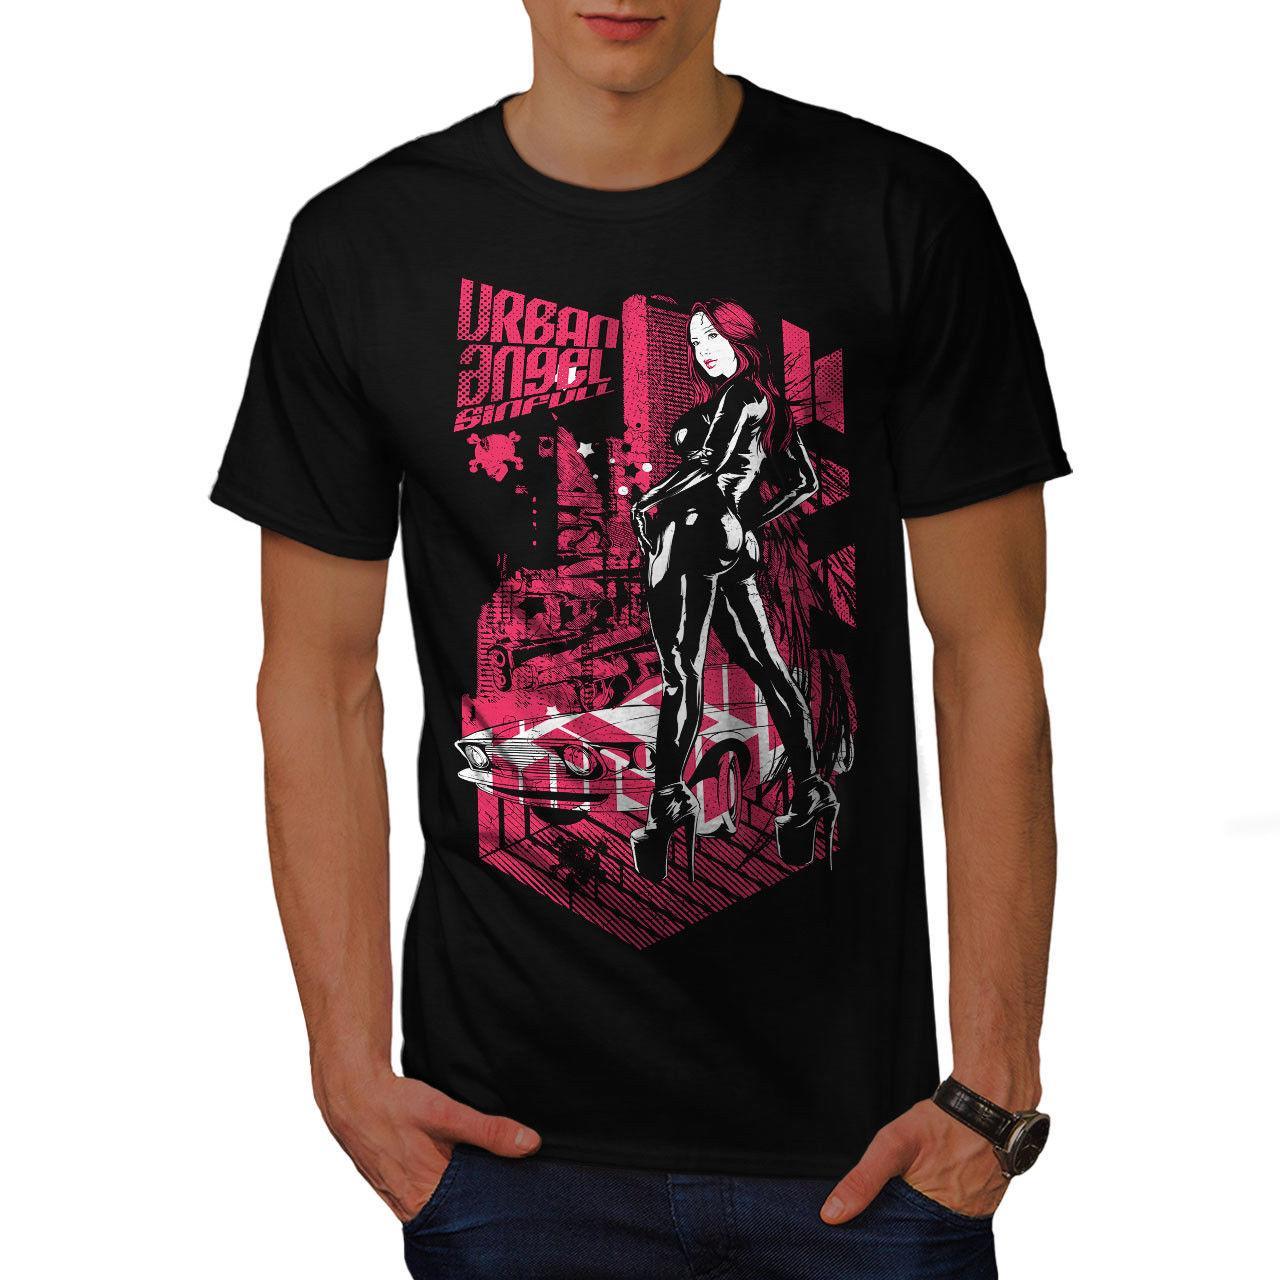 544be9424196f Wellcoda Urban Girl Street Fashion Mens T Shirt